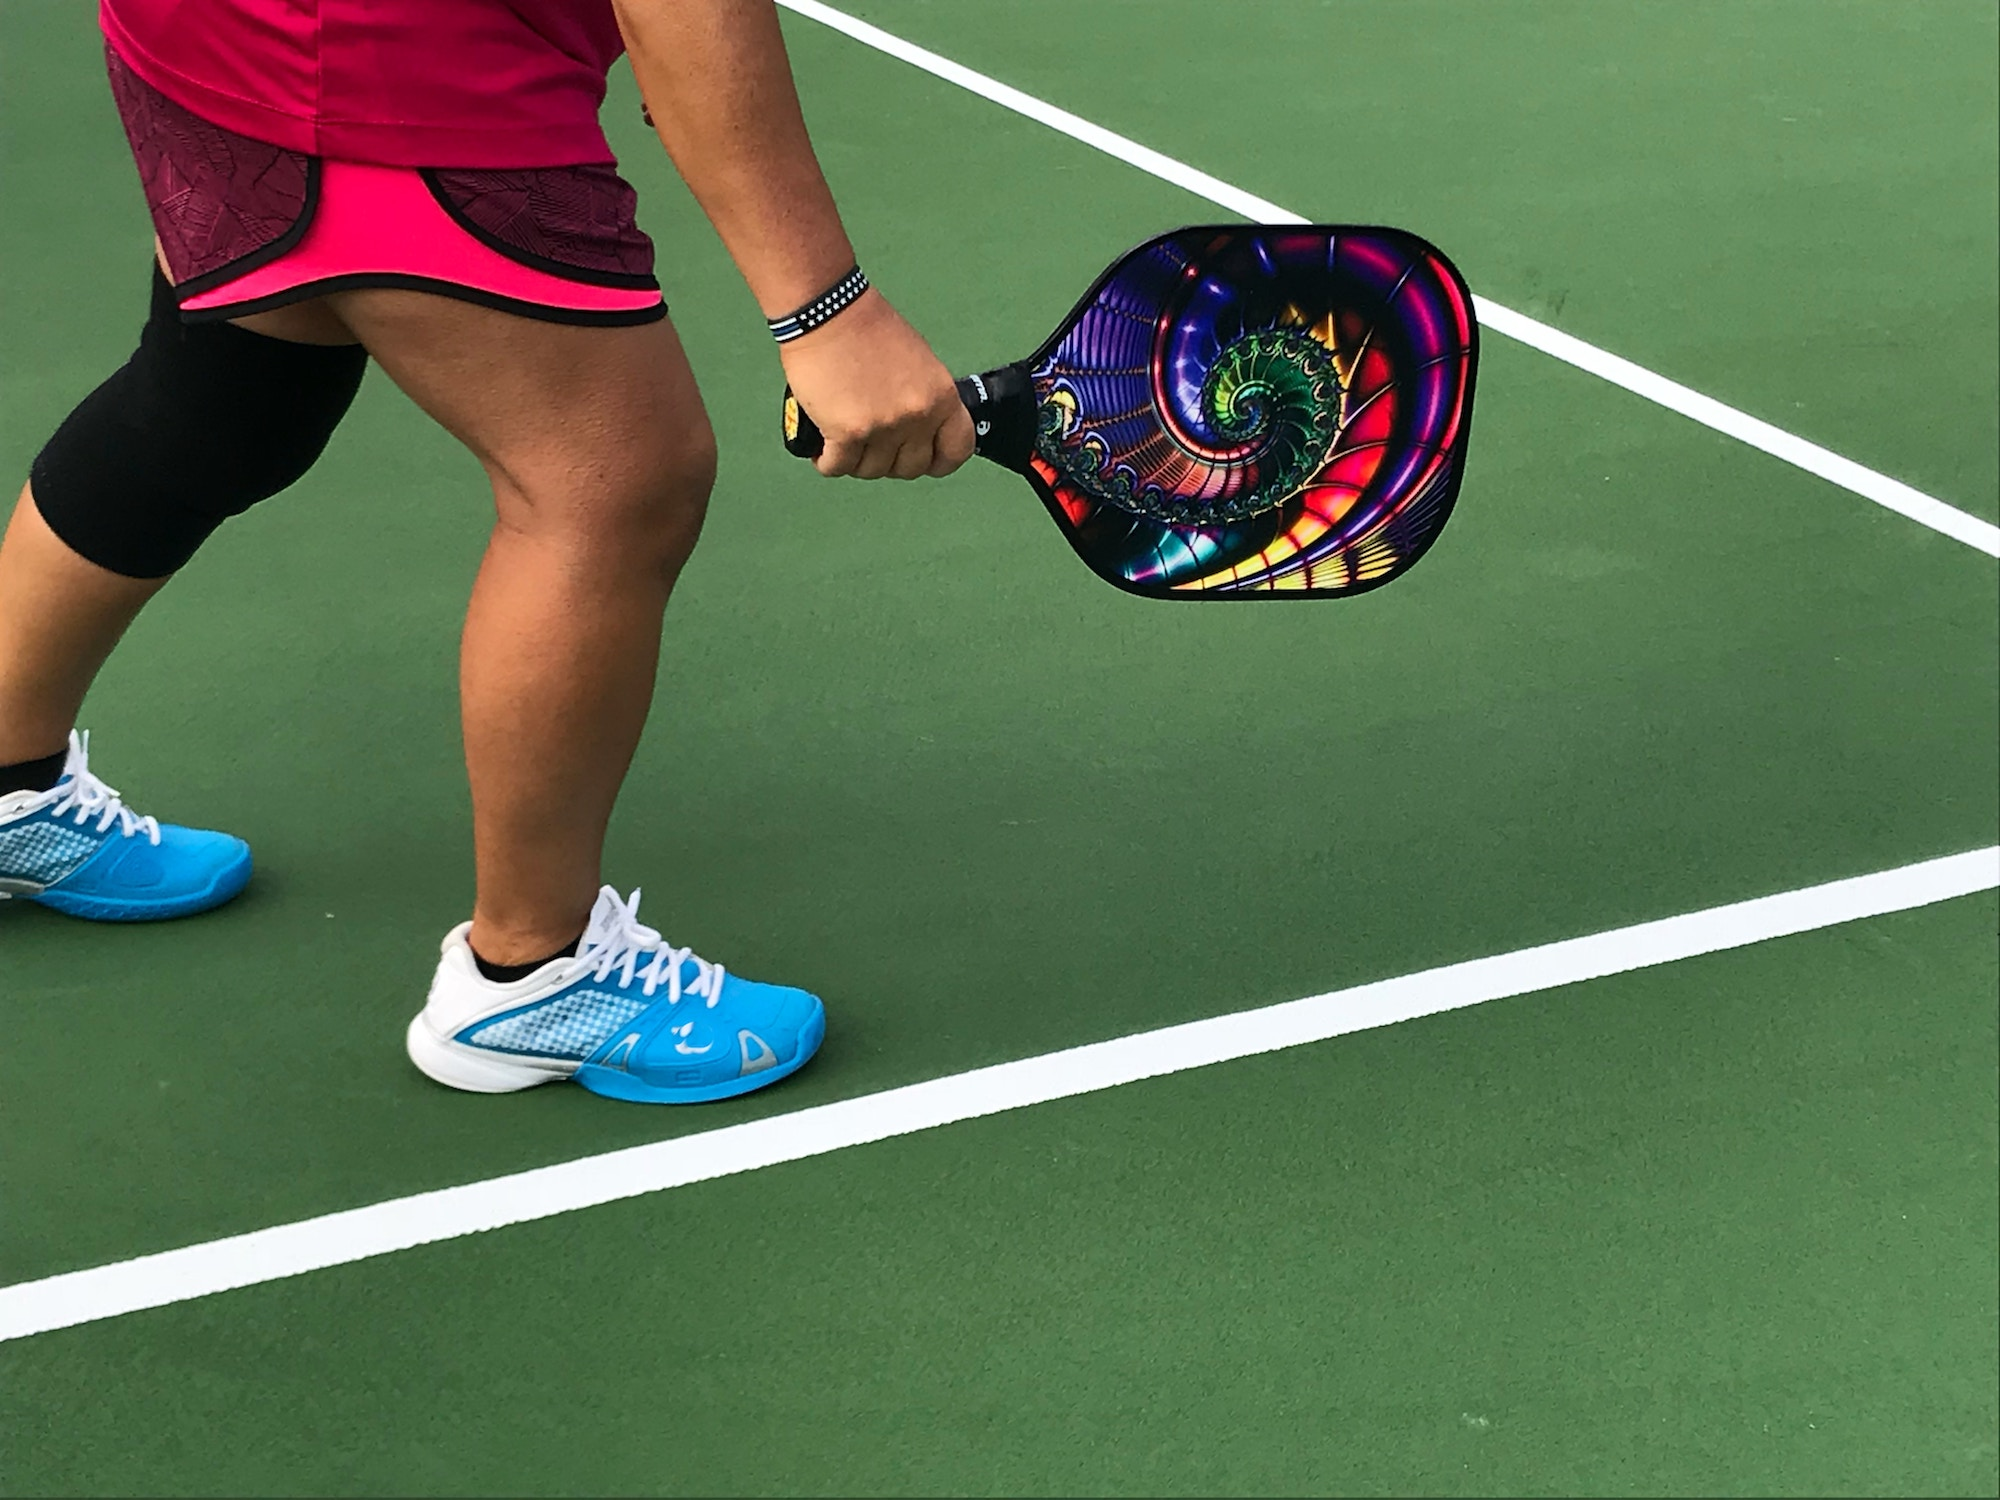 Tennis + Pickleball